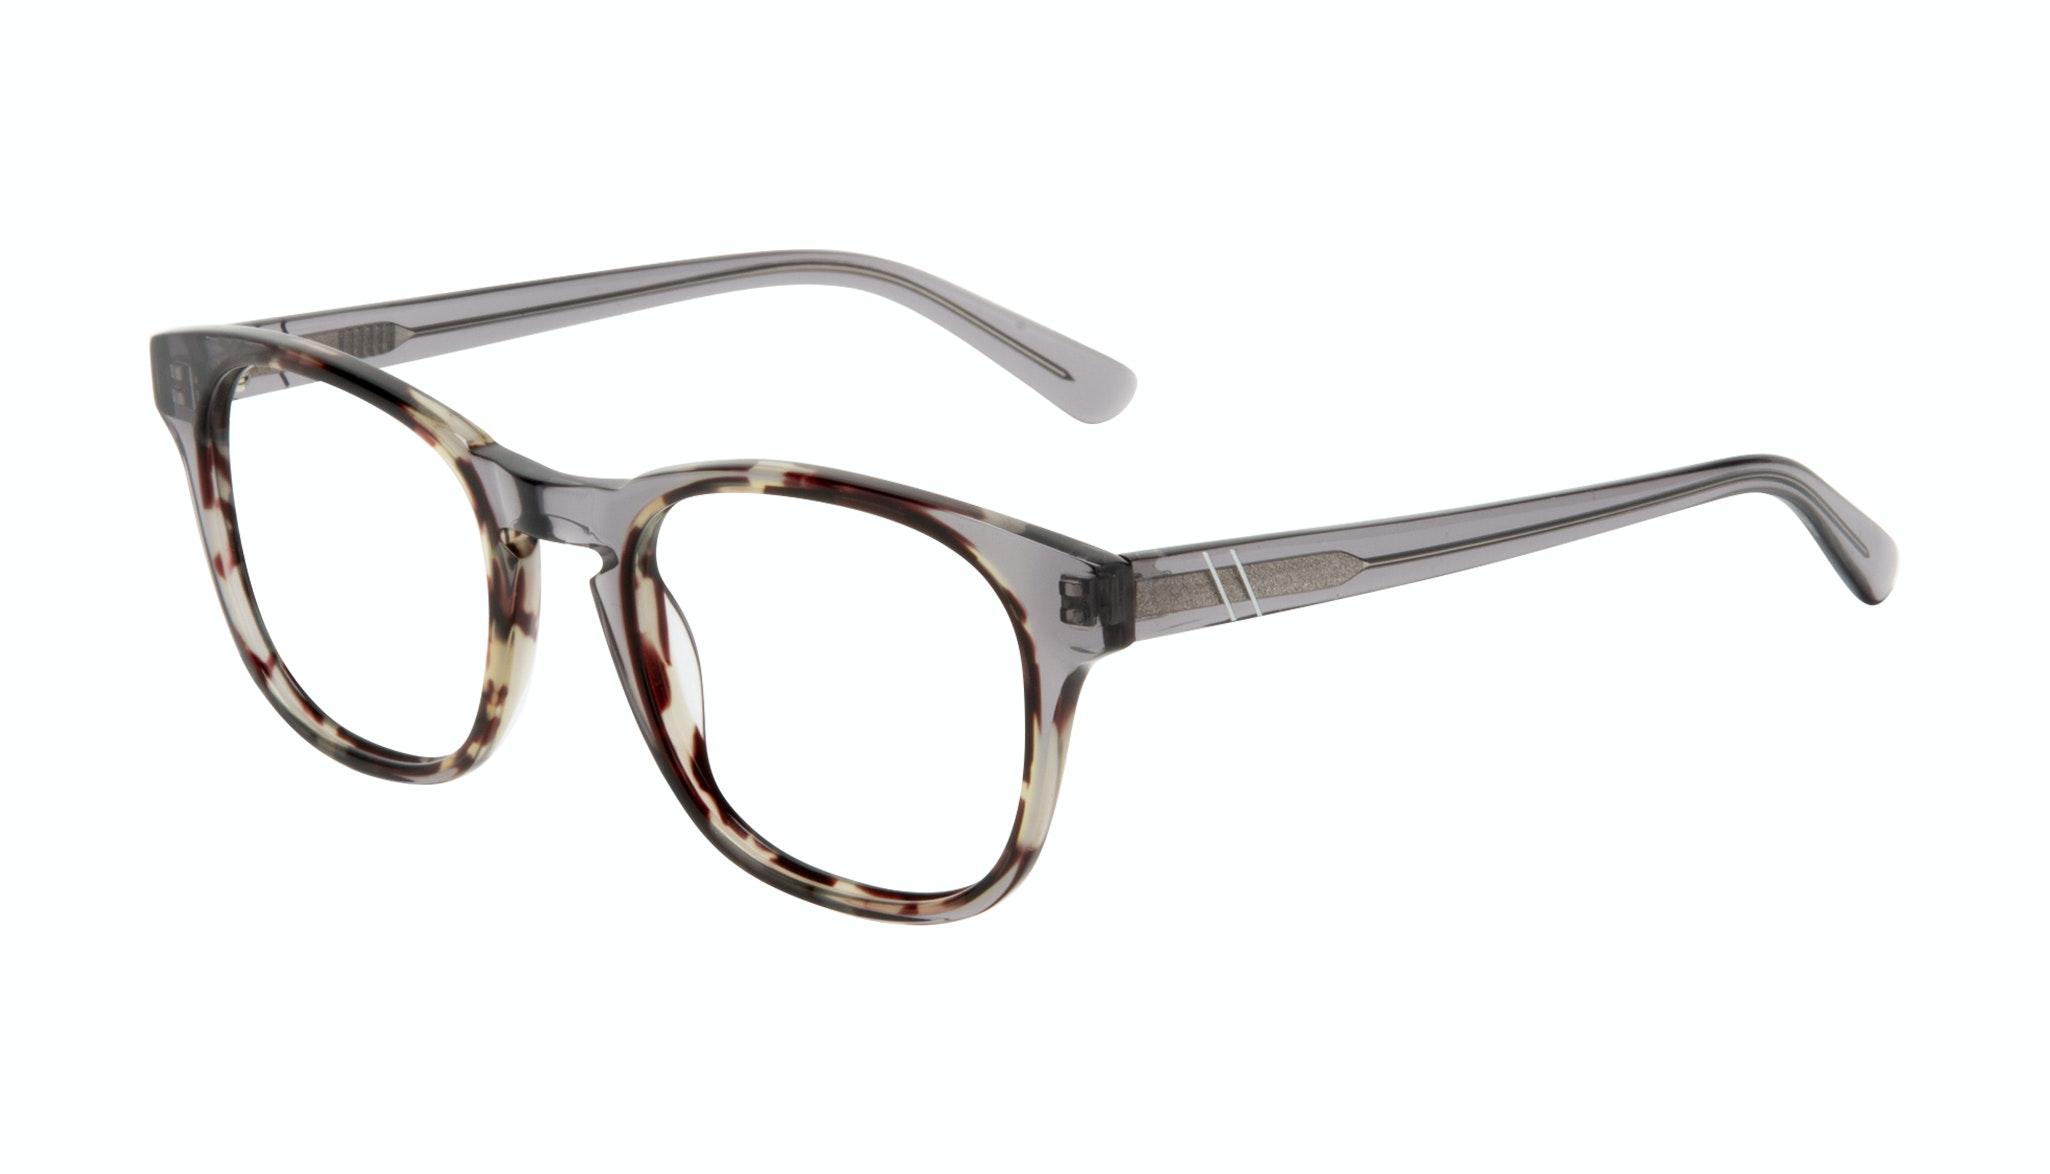 Affordable Fashion Glasses Square Eyeglasses Men Outline Smokey Tort Tilt